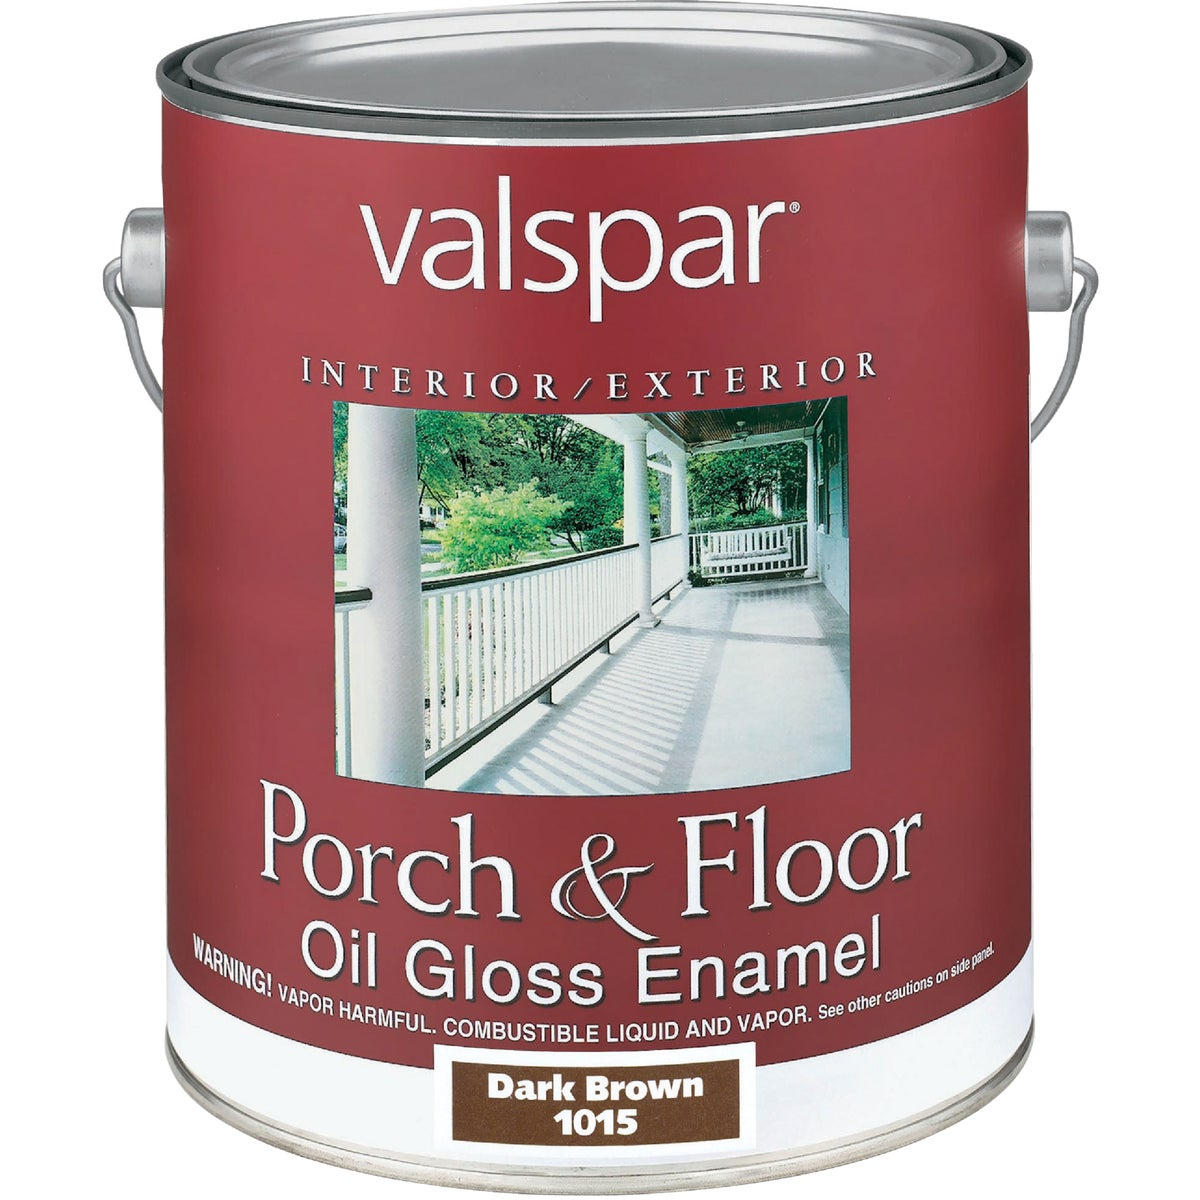 DK BRN OIL FLOOR ENAMEL - 027.0001015.007 by Valspar Corp